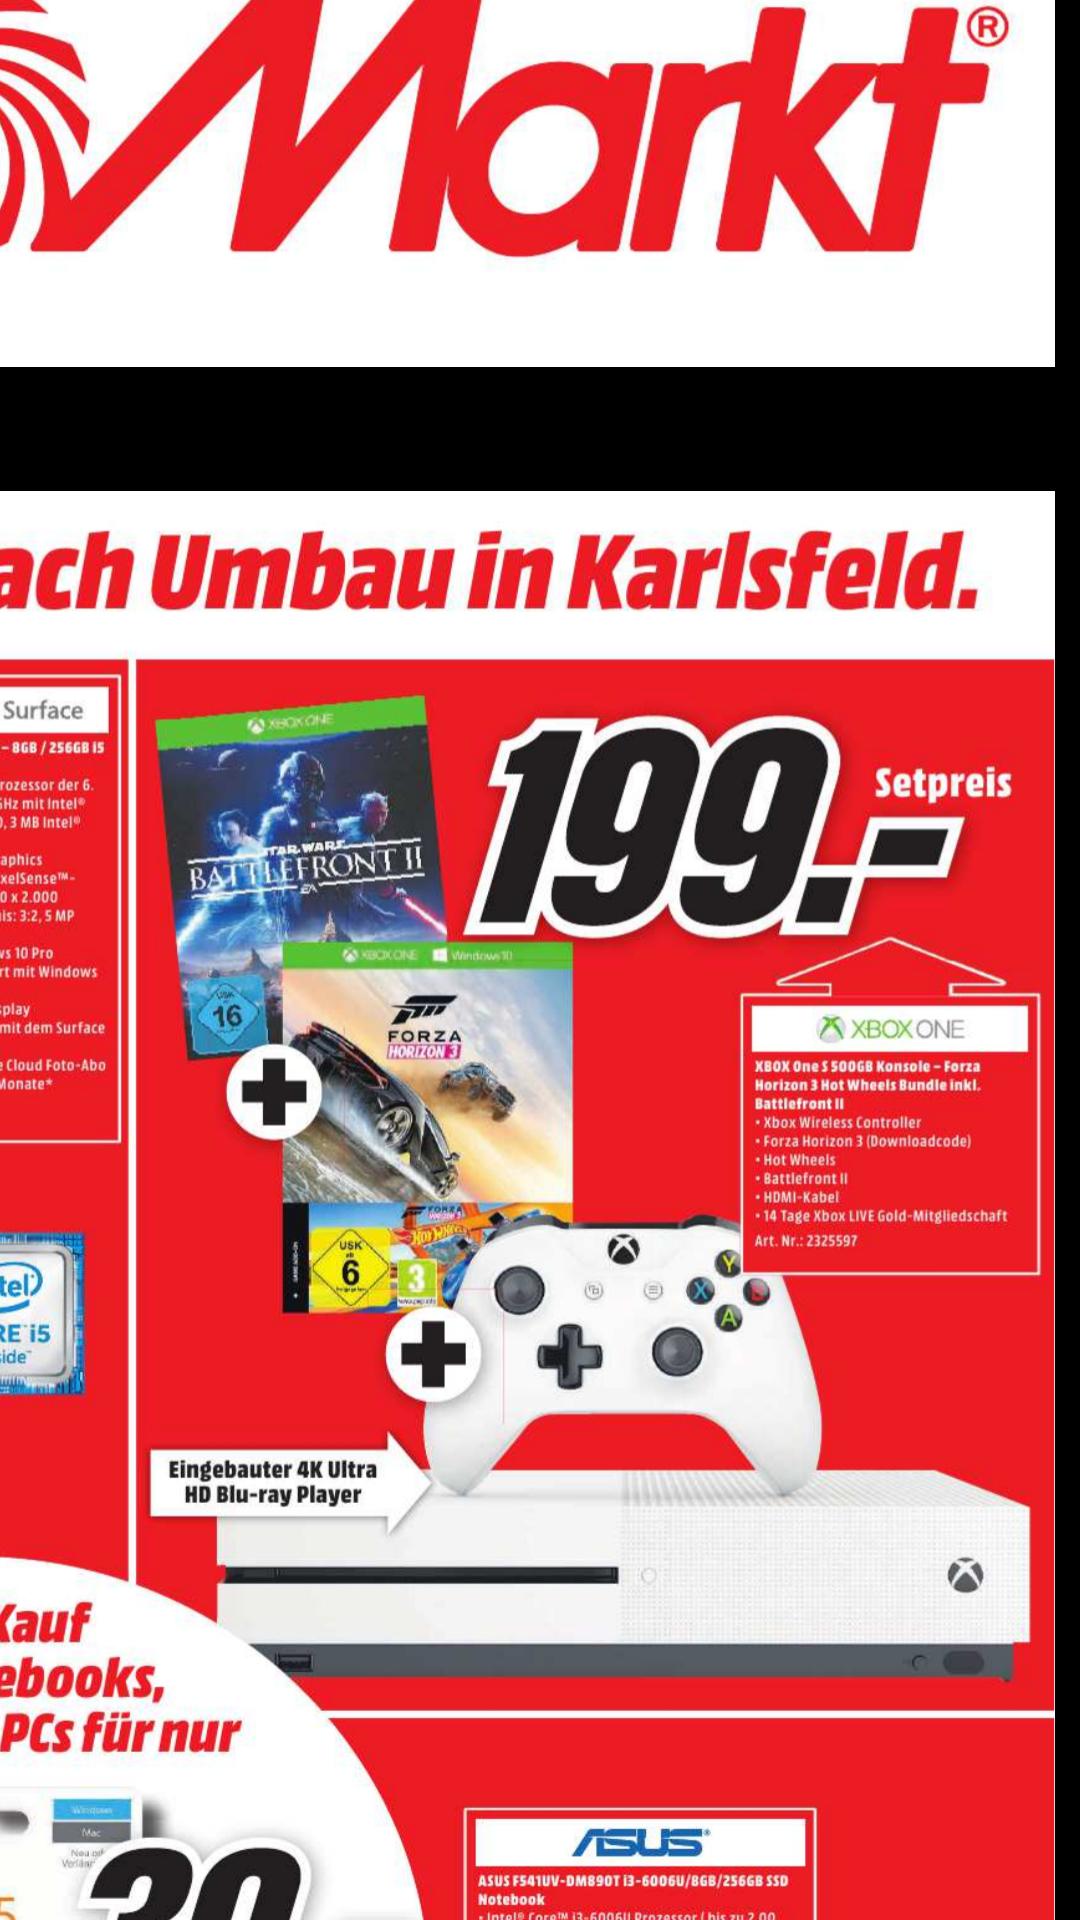 (MM Karlsfeld) XBox One S 500 GB + Forza Horizon 3 + Hot Wheels Add-on + Star Wars BF2